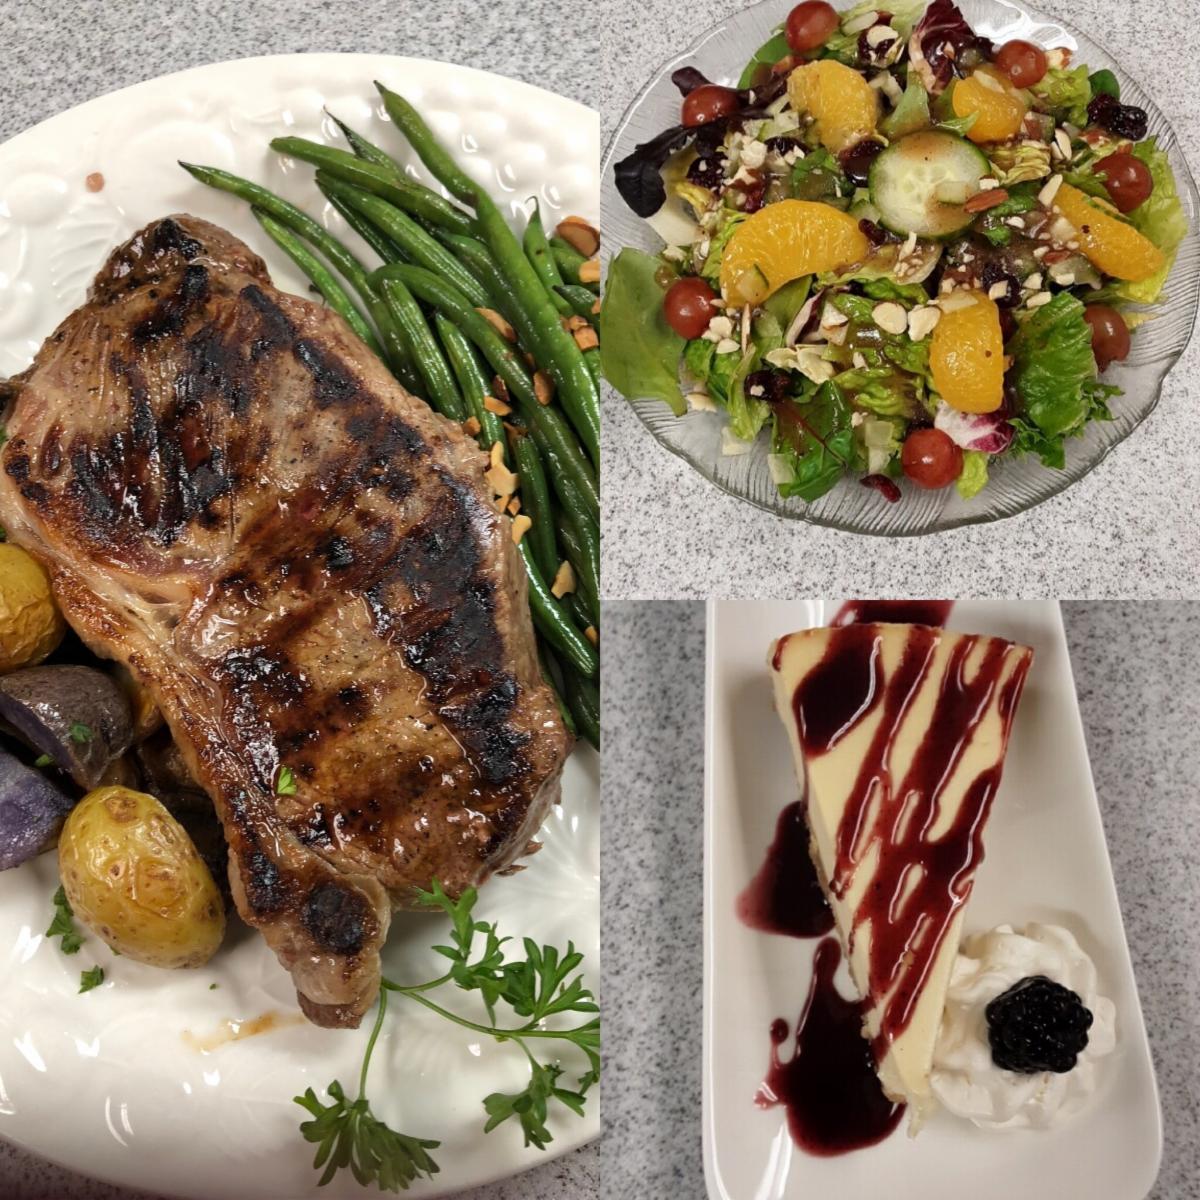 Sample dinner with NY strip steak